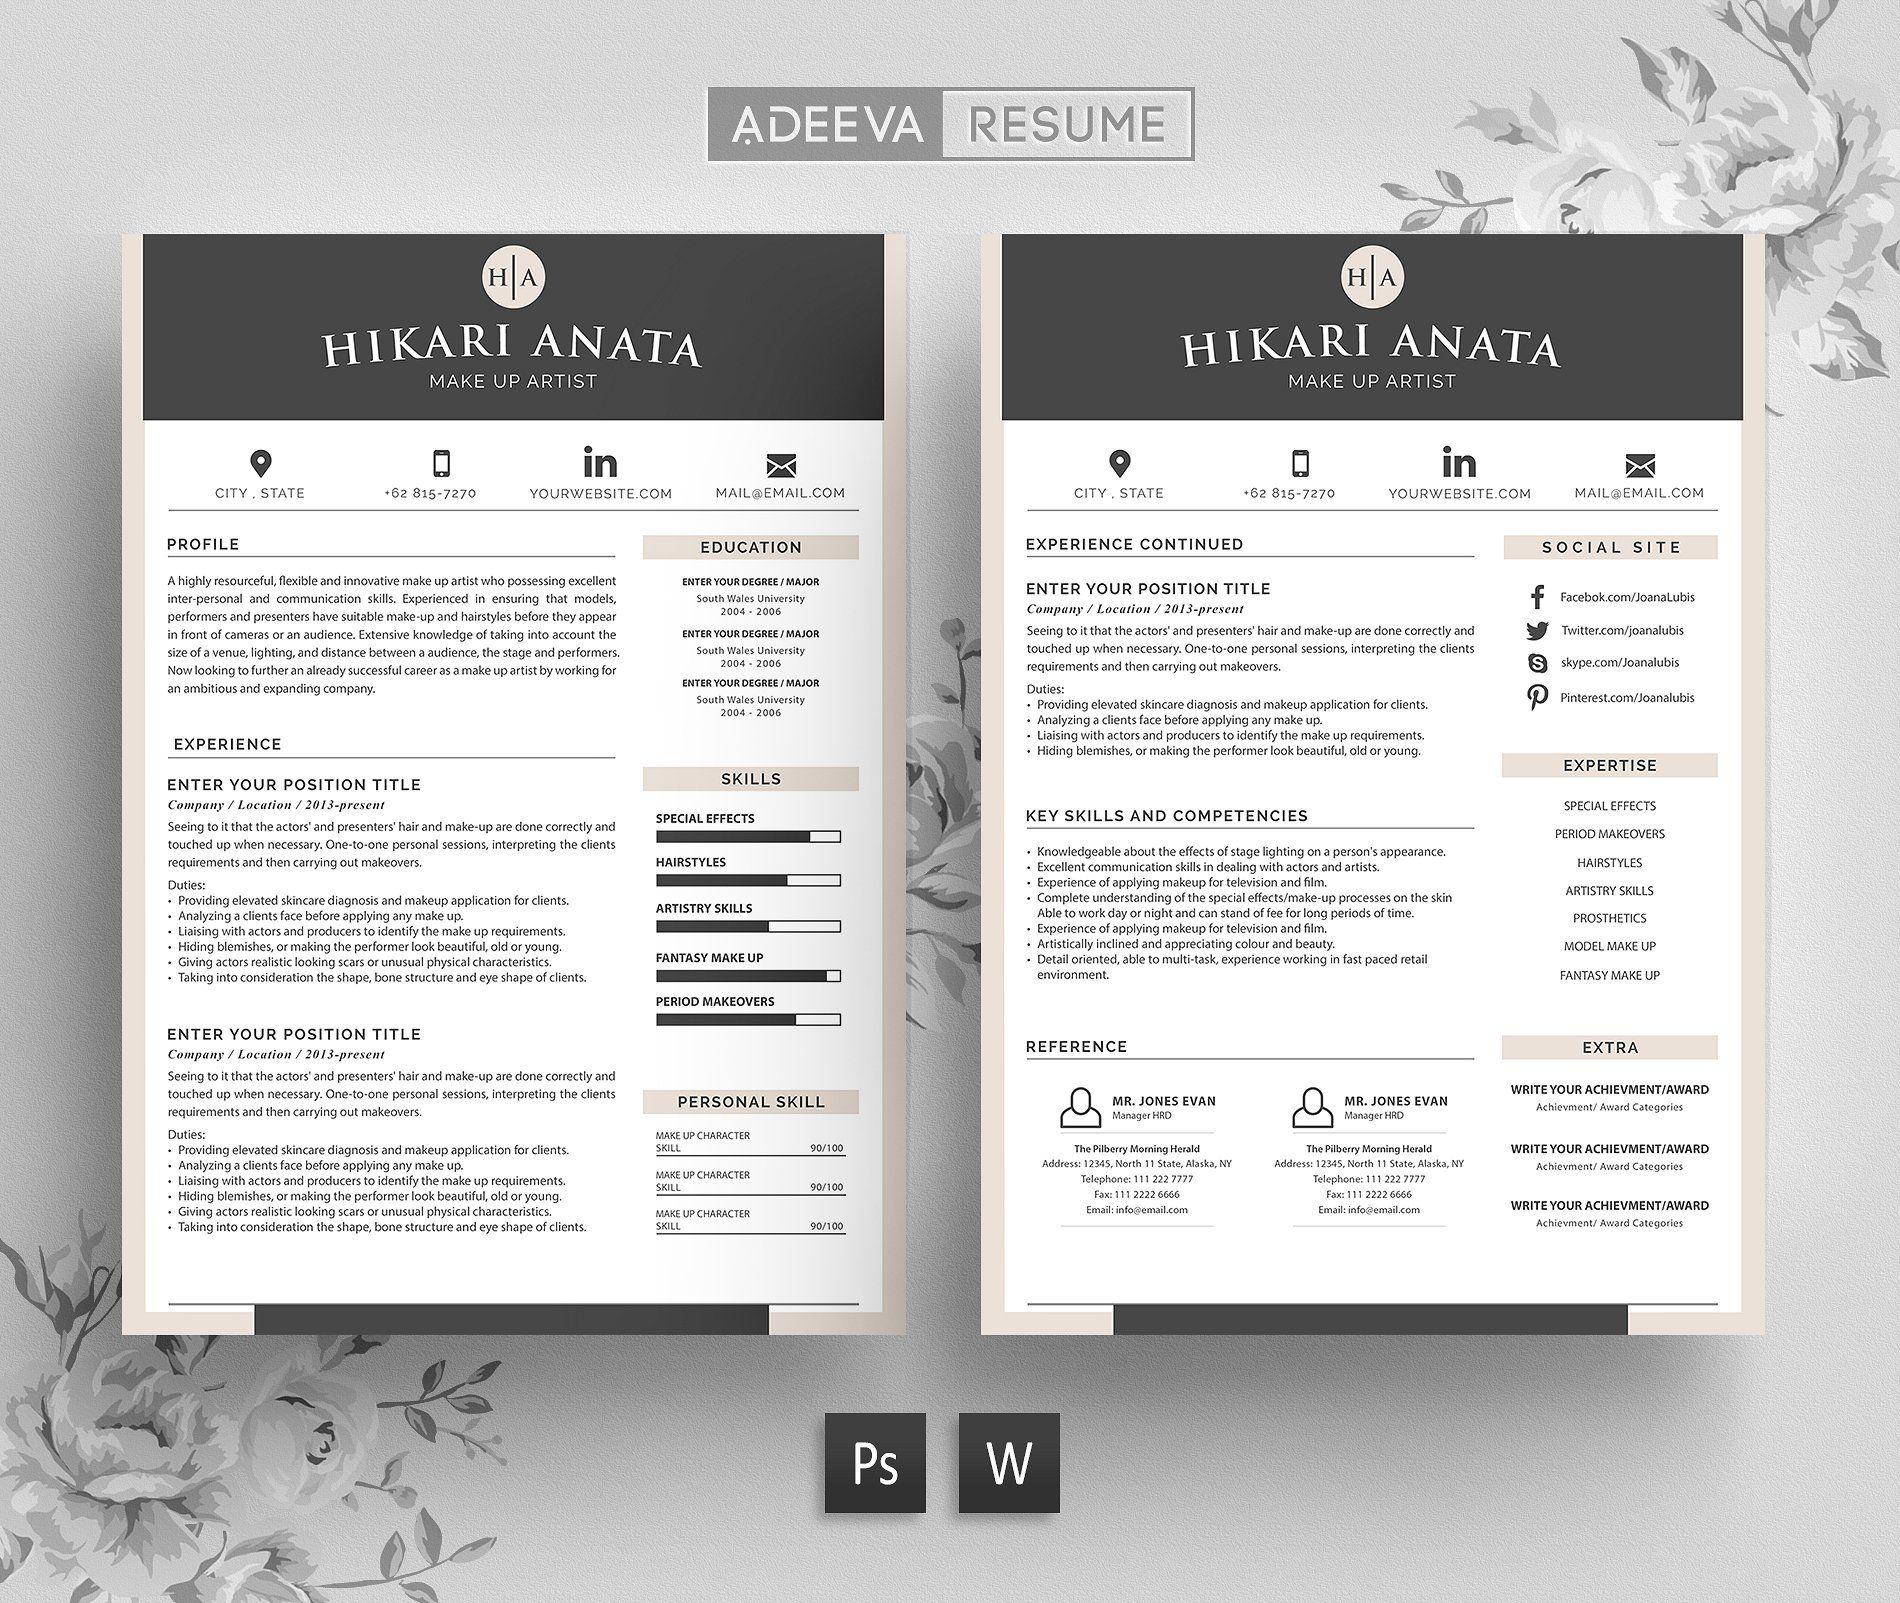 Simple Resume Template Anata | Simple resume template, Simple resume ...